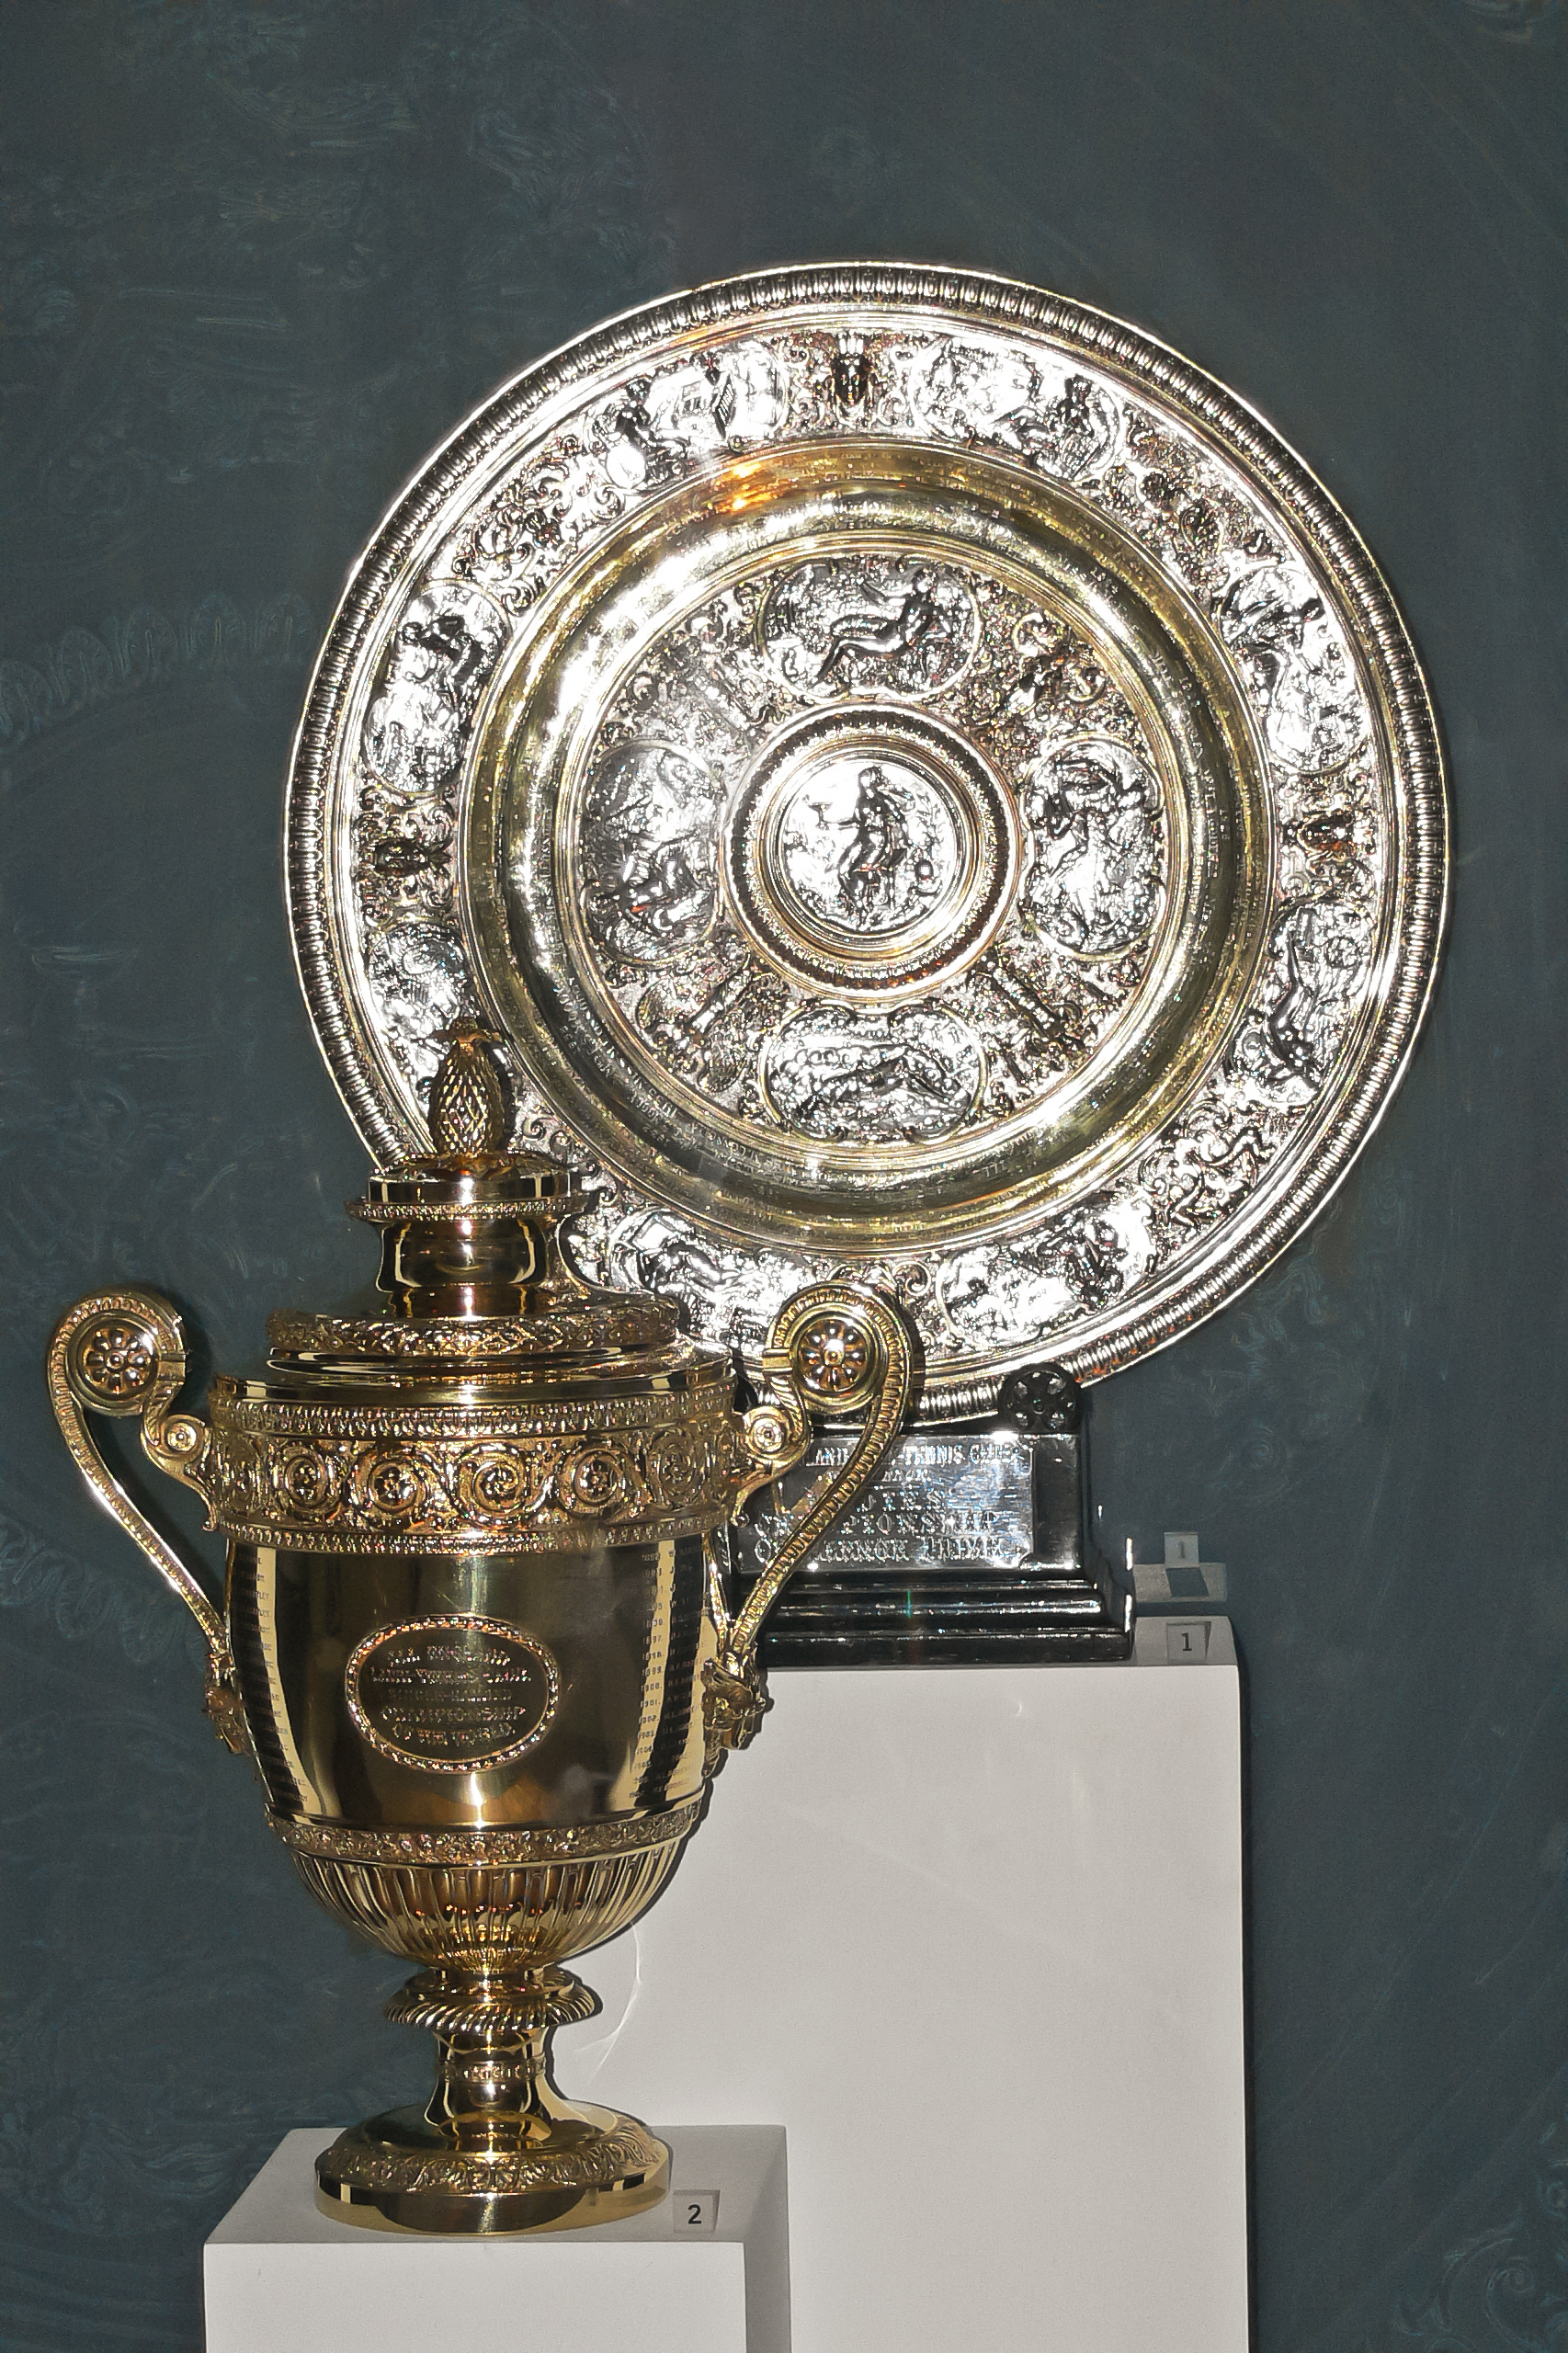 Wimbledon_trophies.jpg (1706×2560)